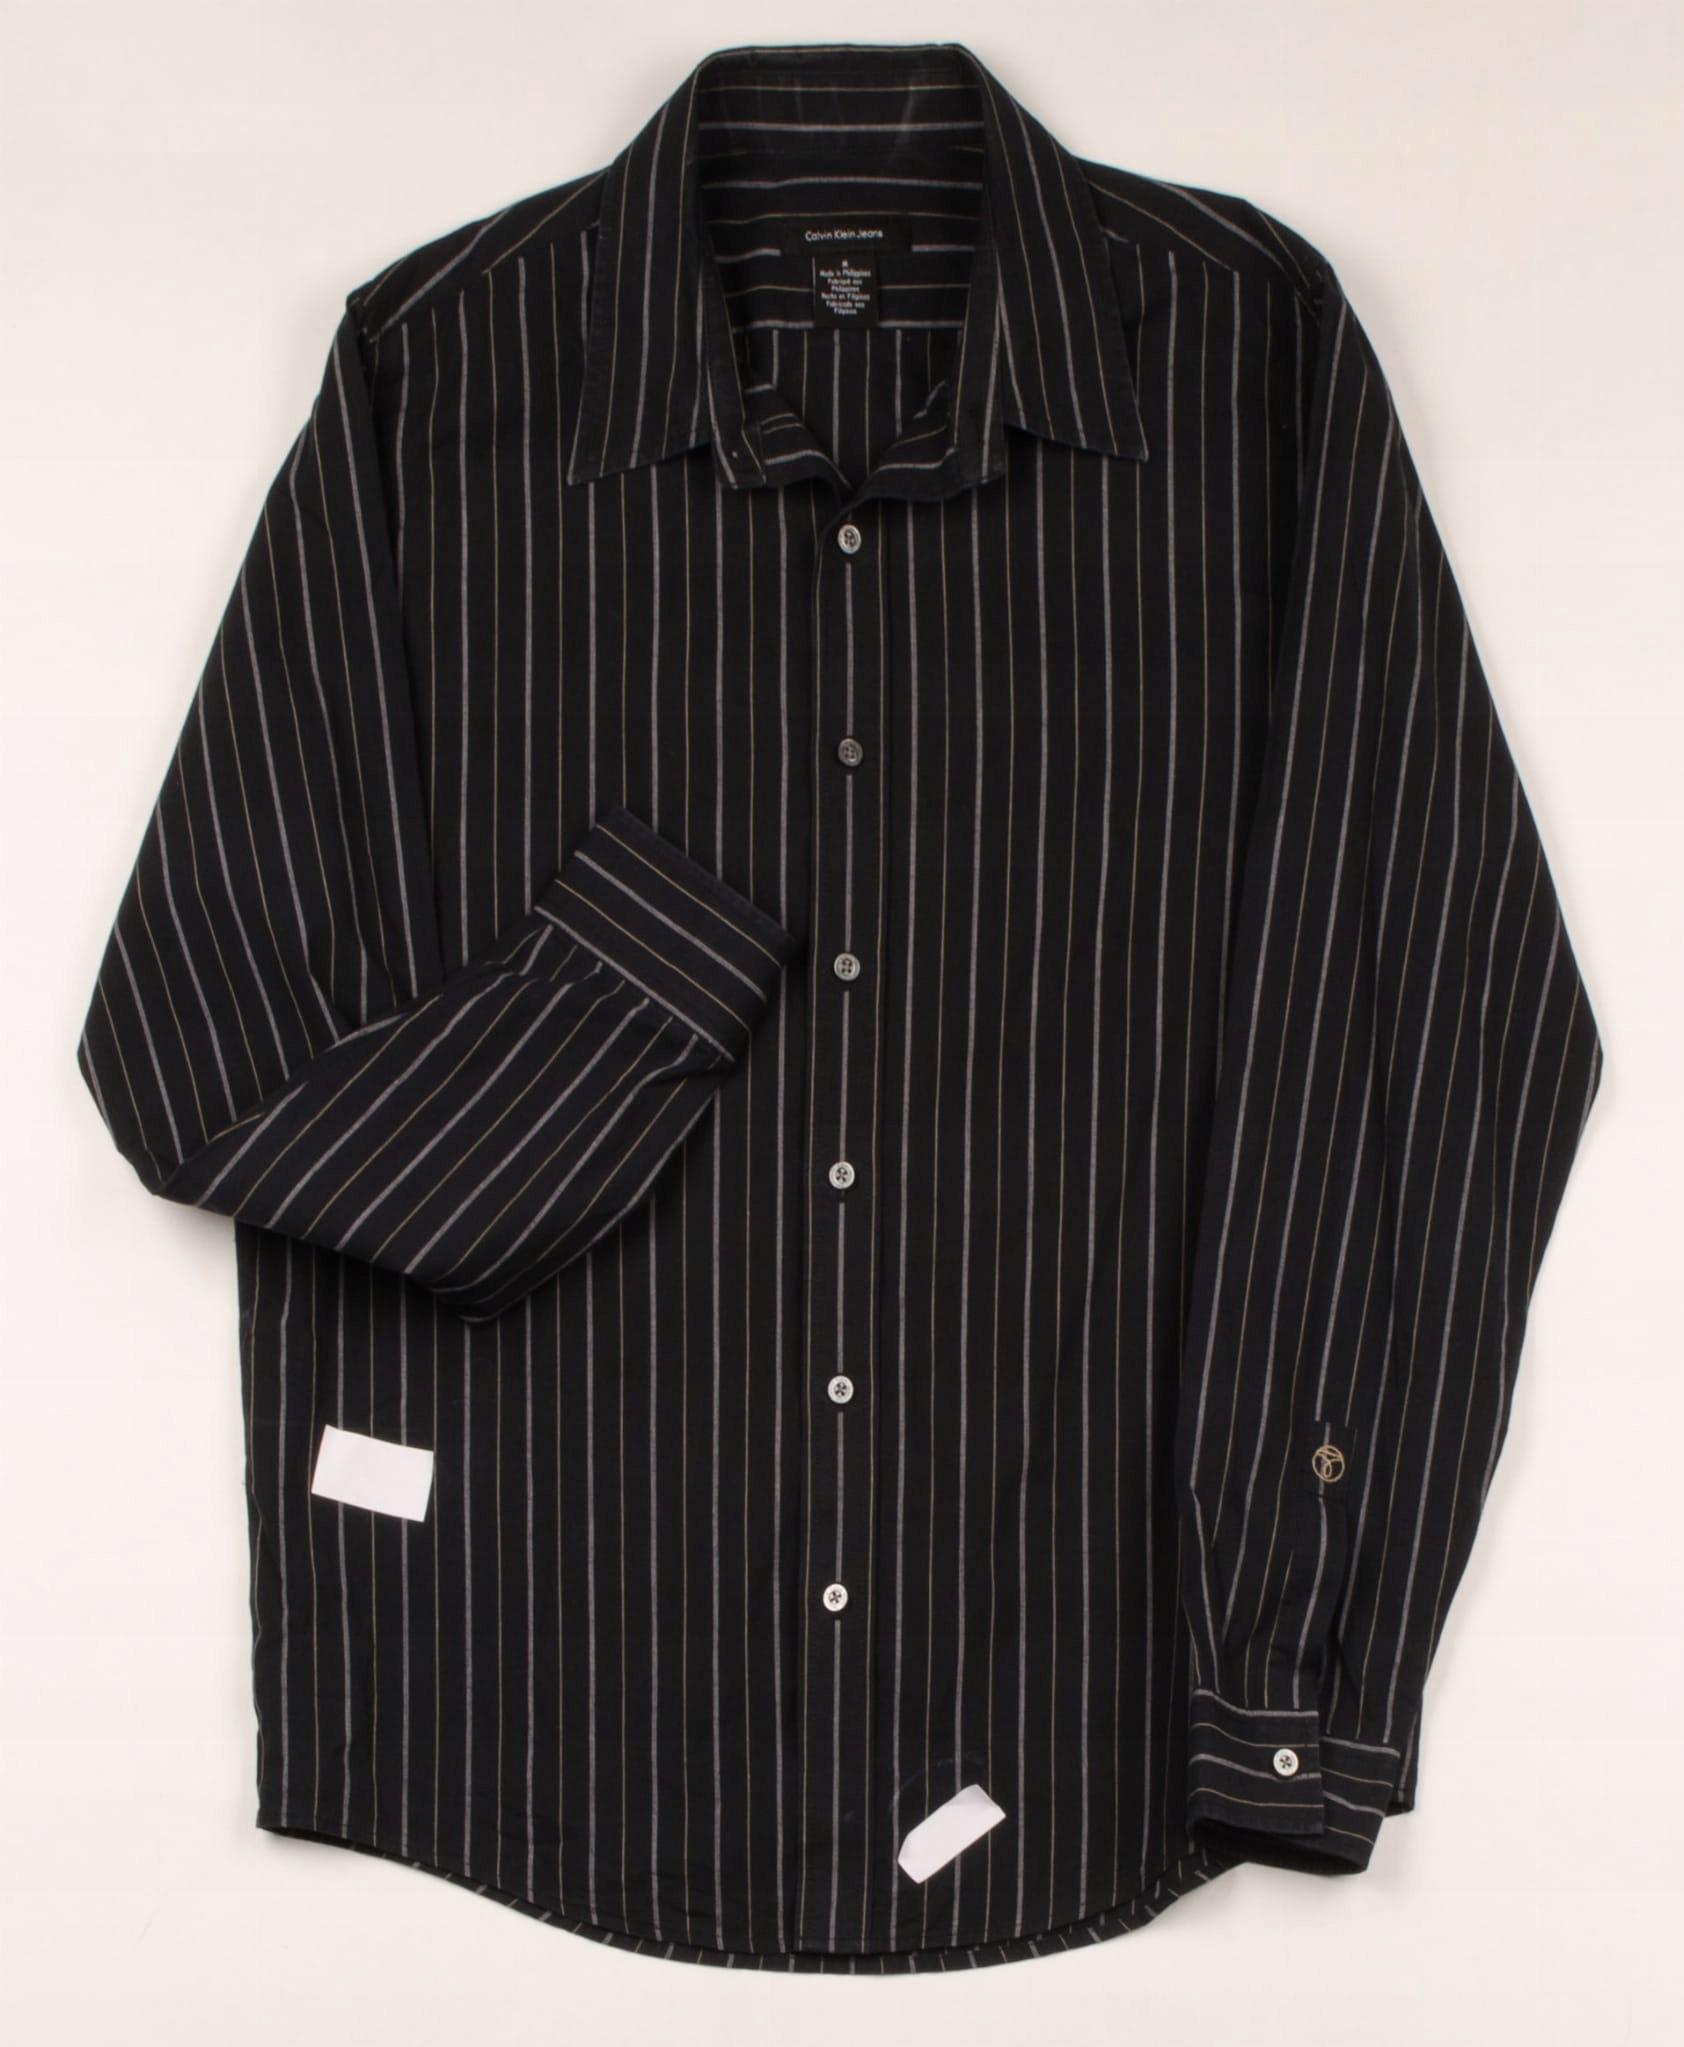 36820 Pranie Calvin Klein Koszula Męska M